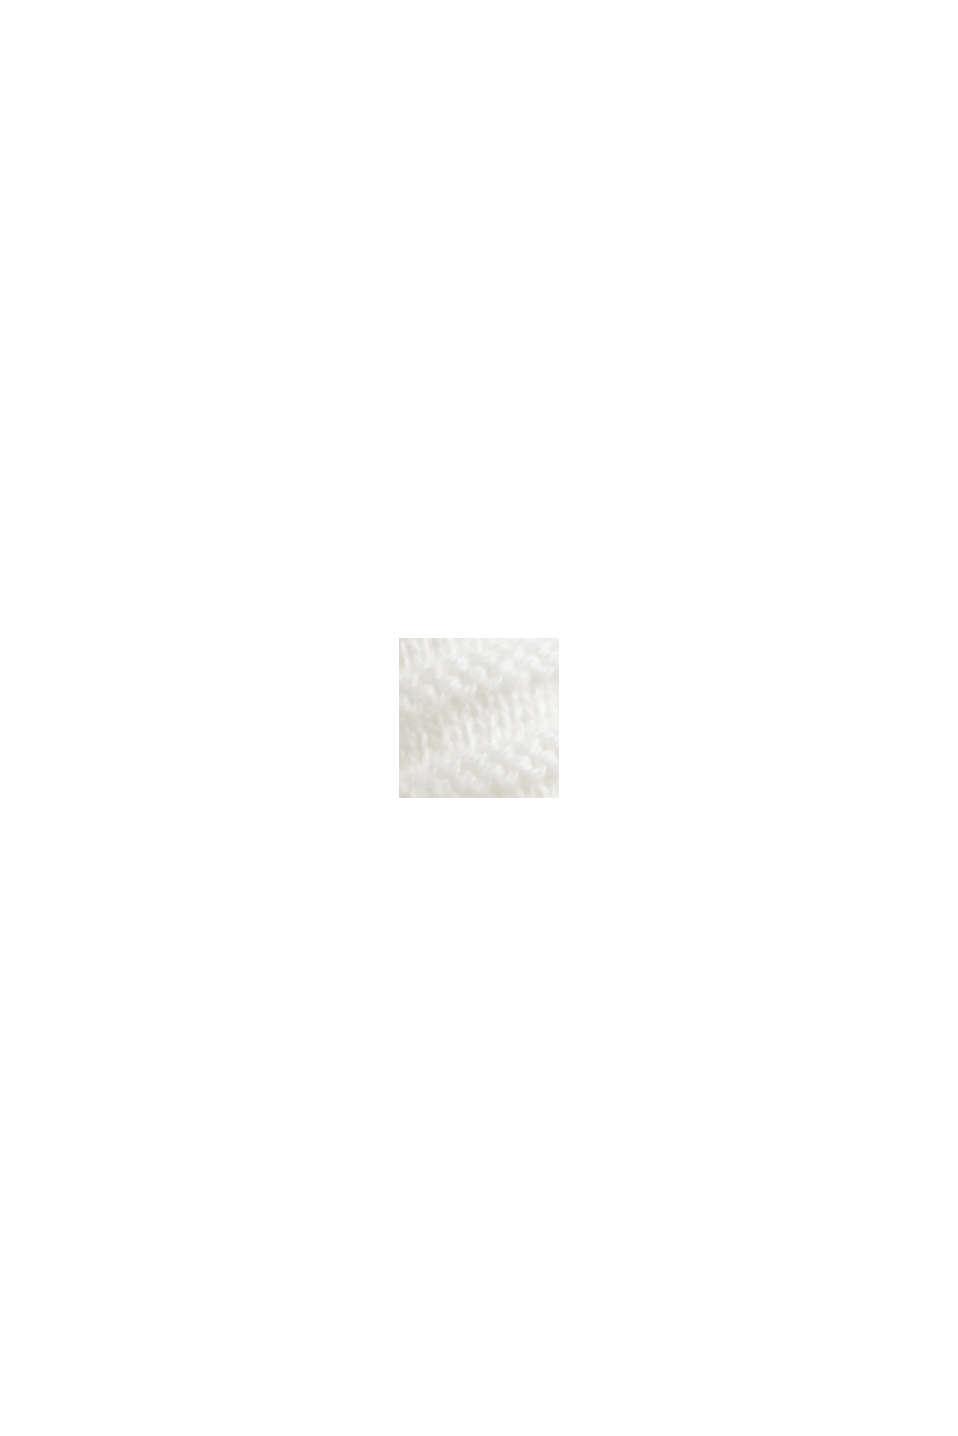 Geribde trui met kraag met tunnelkoord, katoen, OFF WHITE, swatch